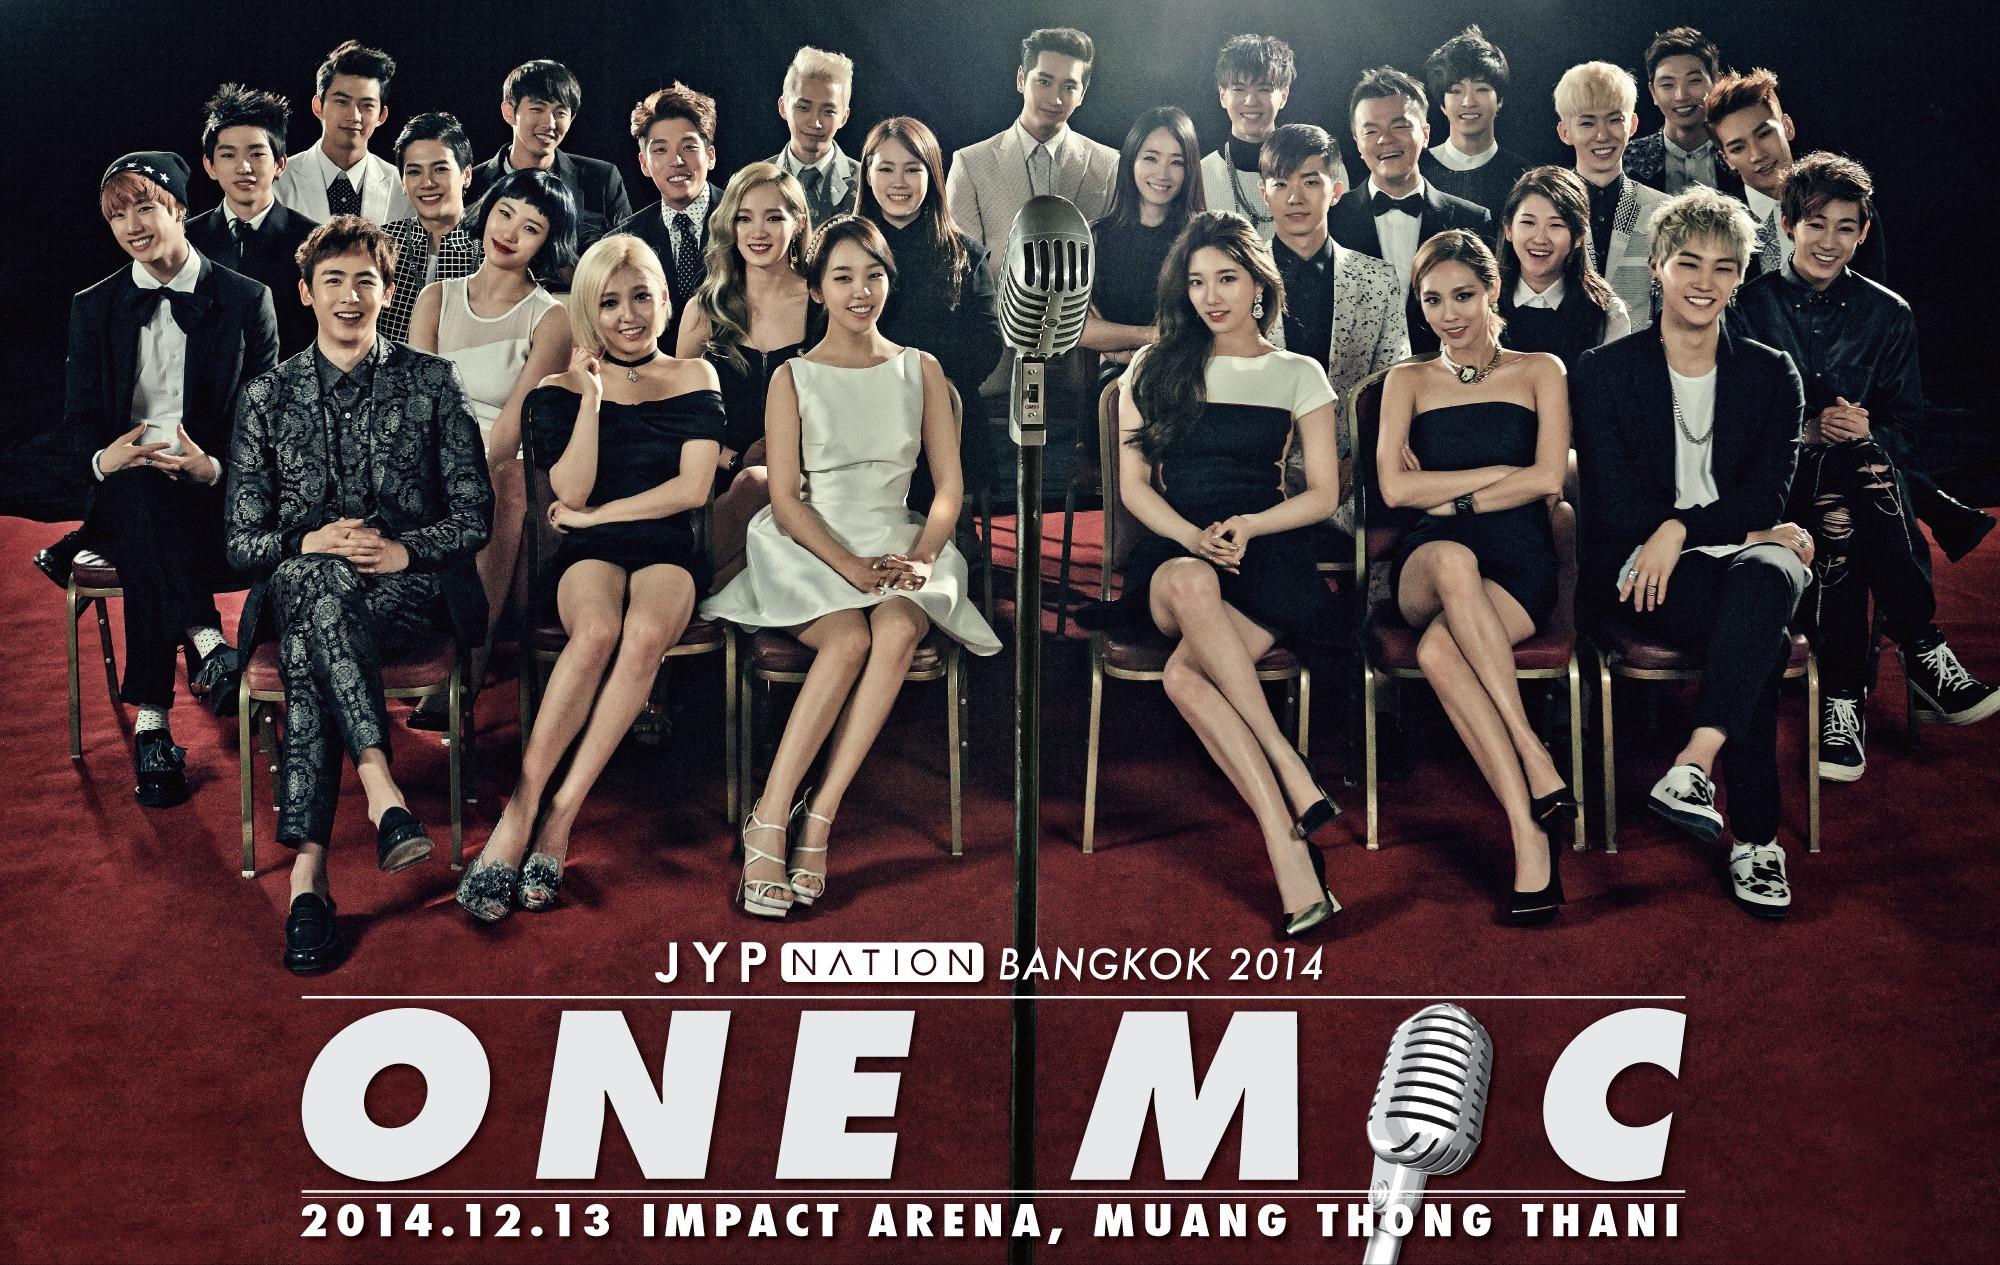 JYP娛樂雖然近幾年表現平平,被批好藝人都被做爛了!但是2015年JYP藝人在歌壇上可圈可點,被網友讚譽有佳唷!